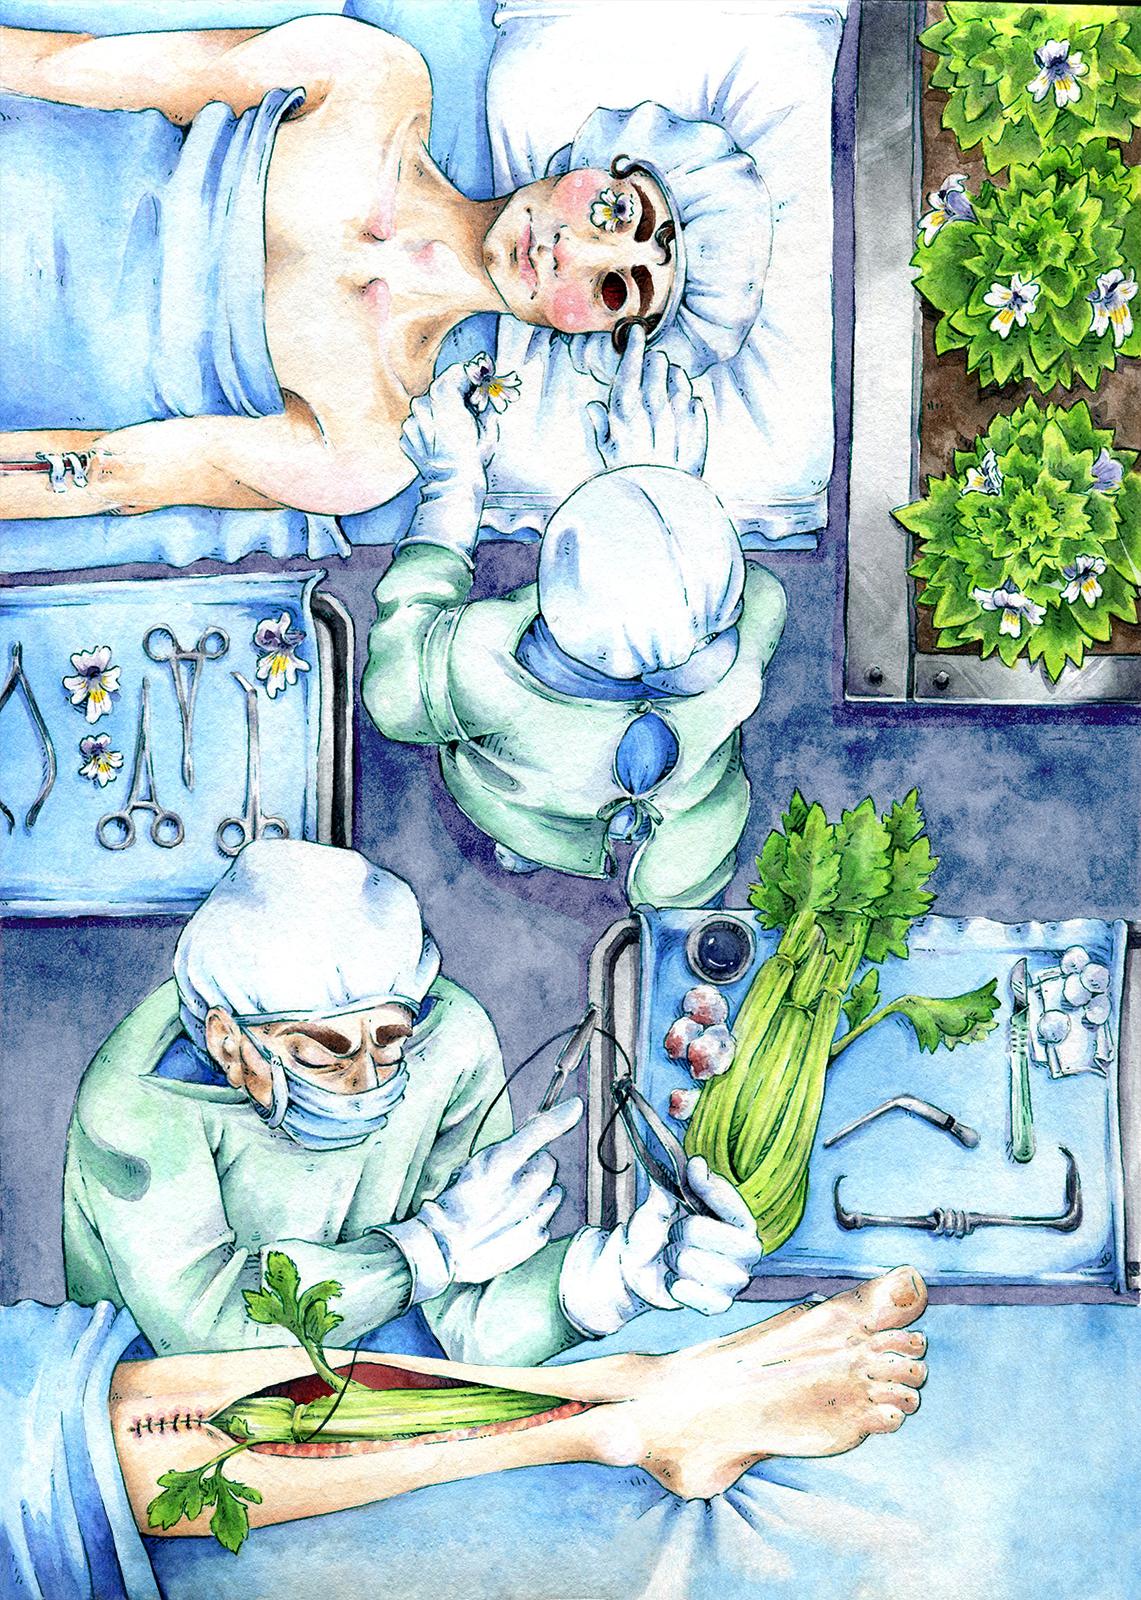 Illustration by Rebecca Schindler-Wood